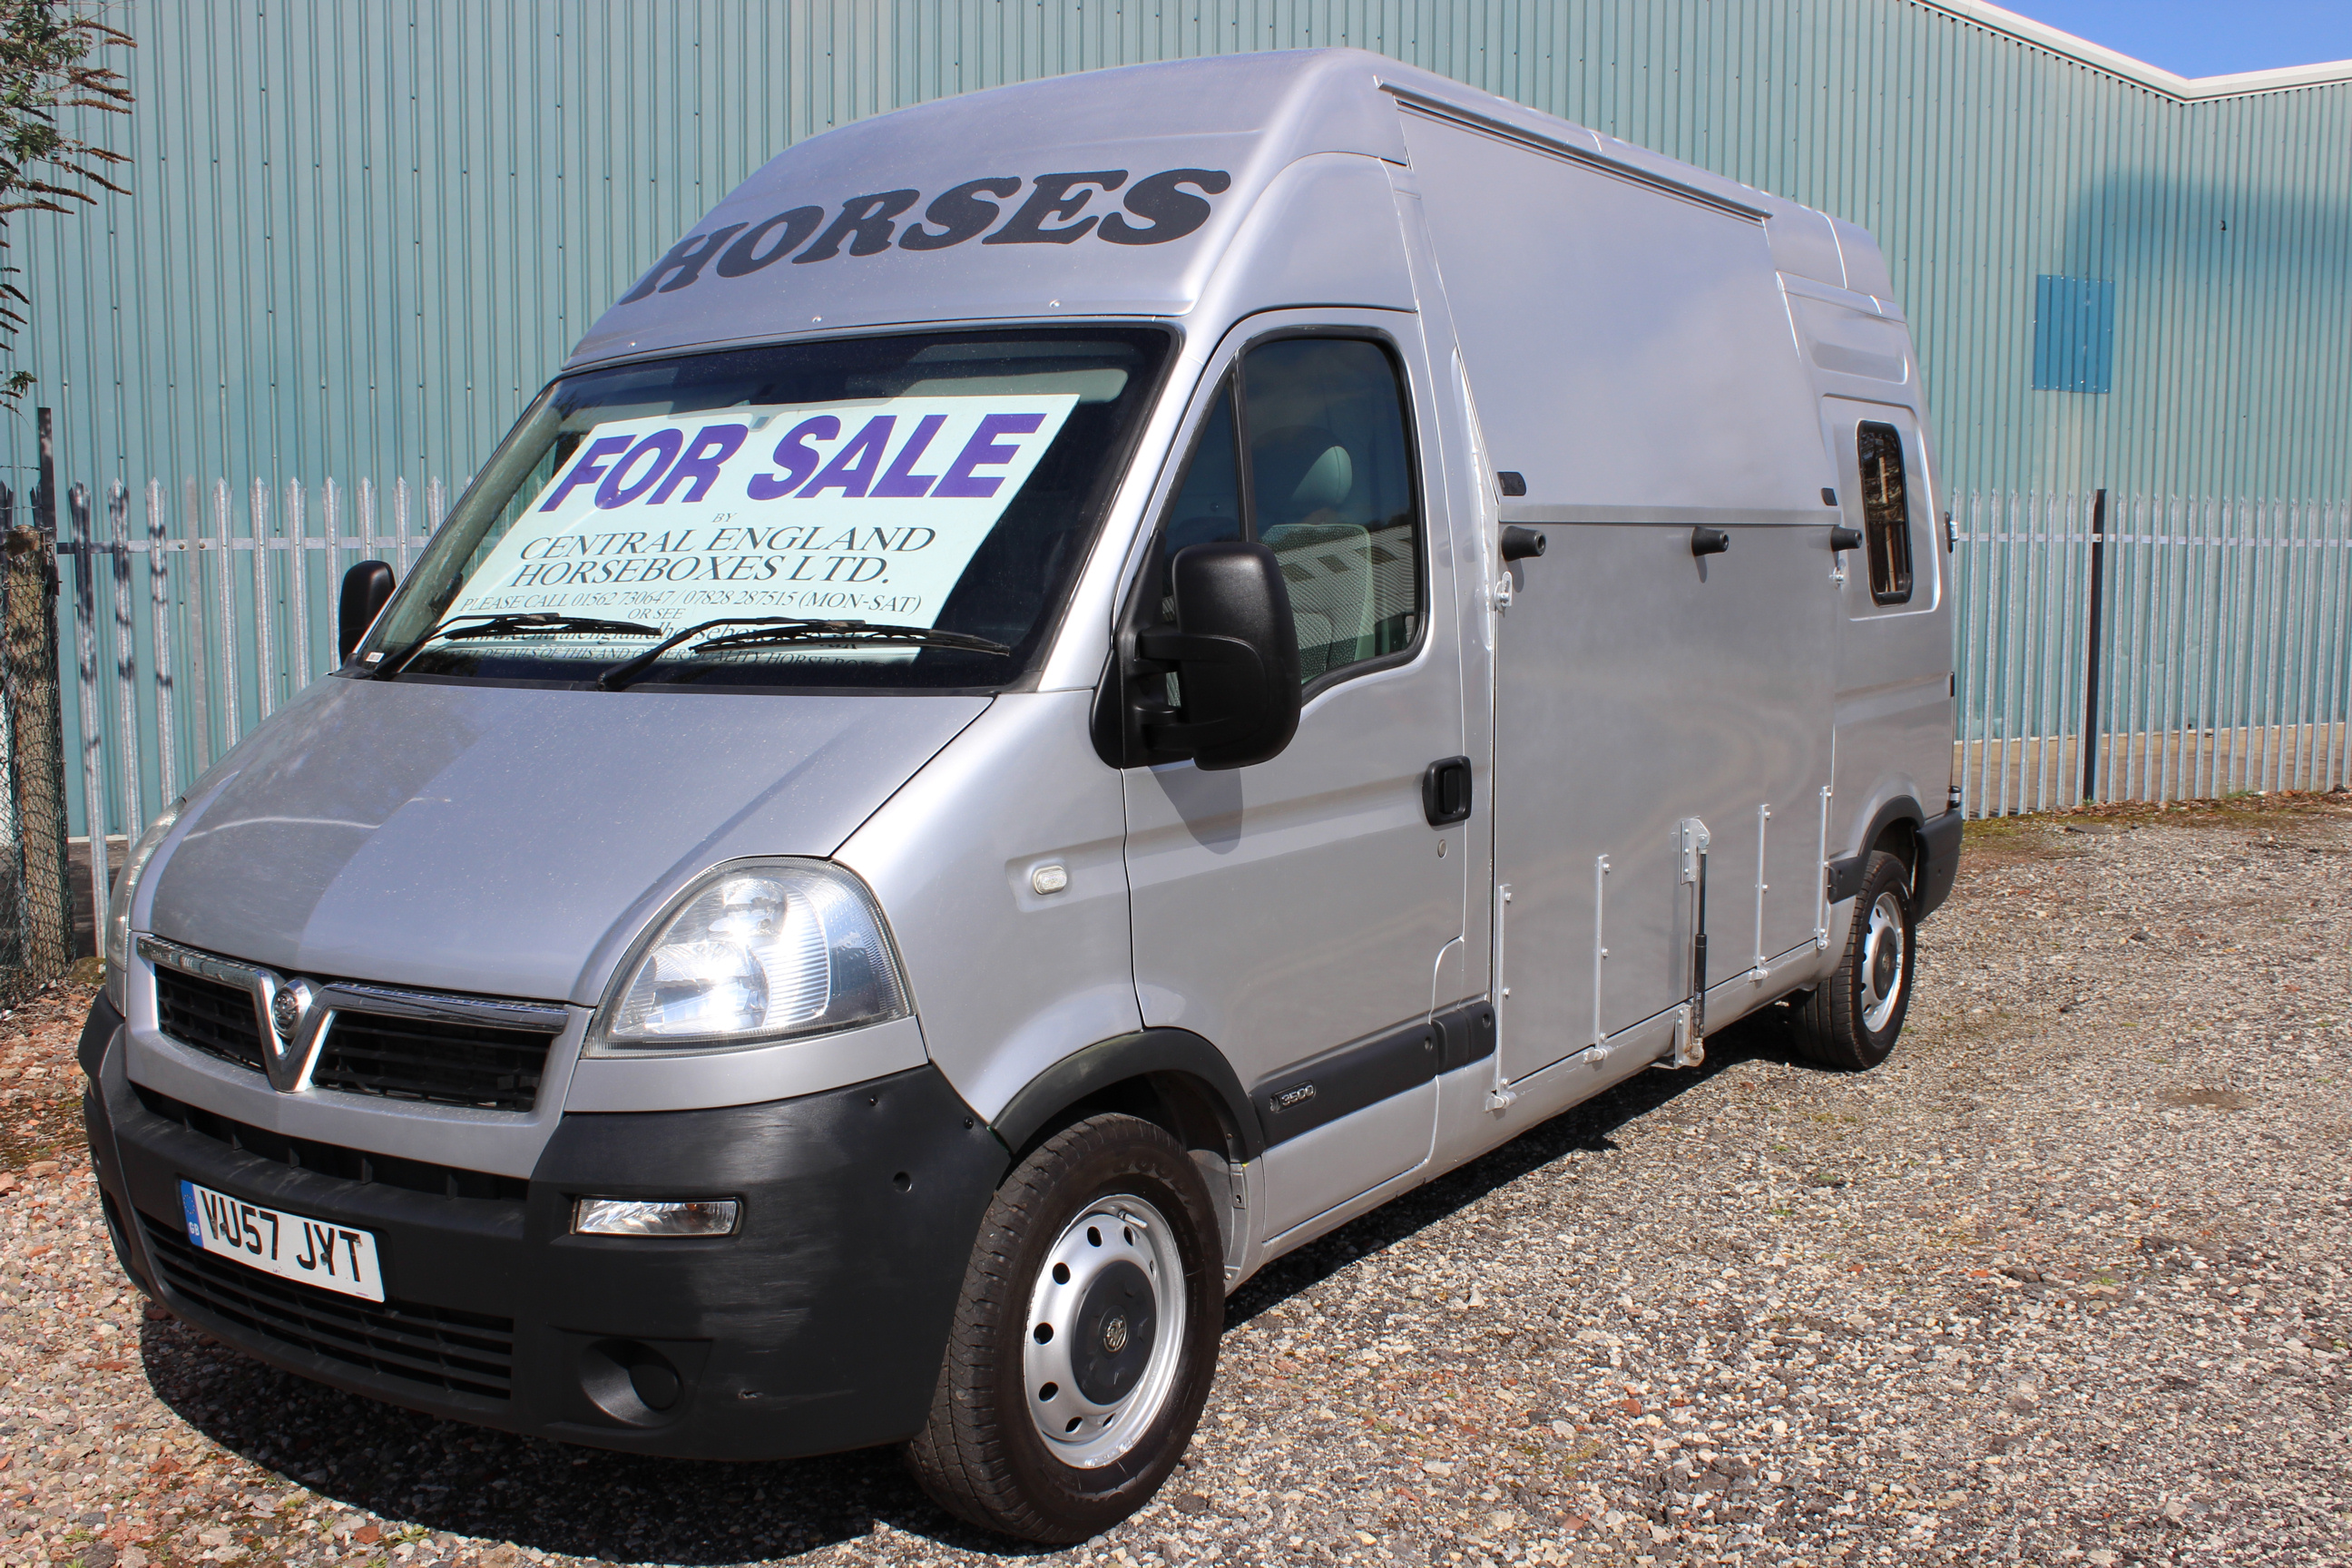 3.5t horsevan for sale